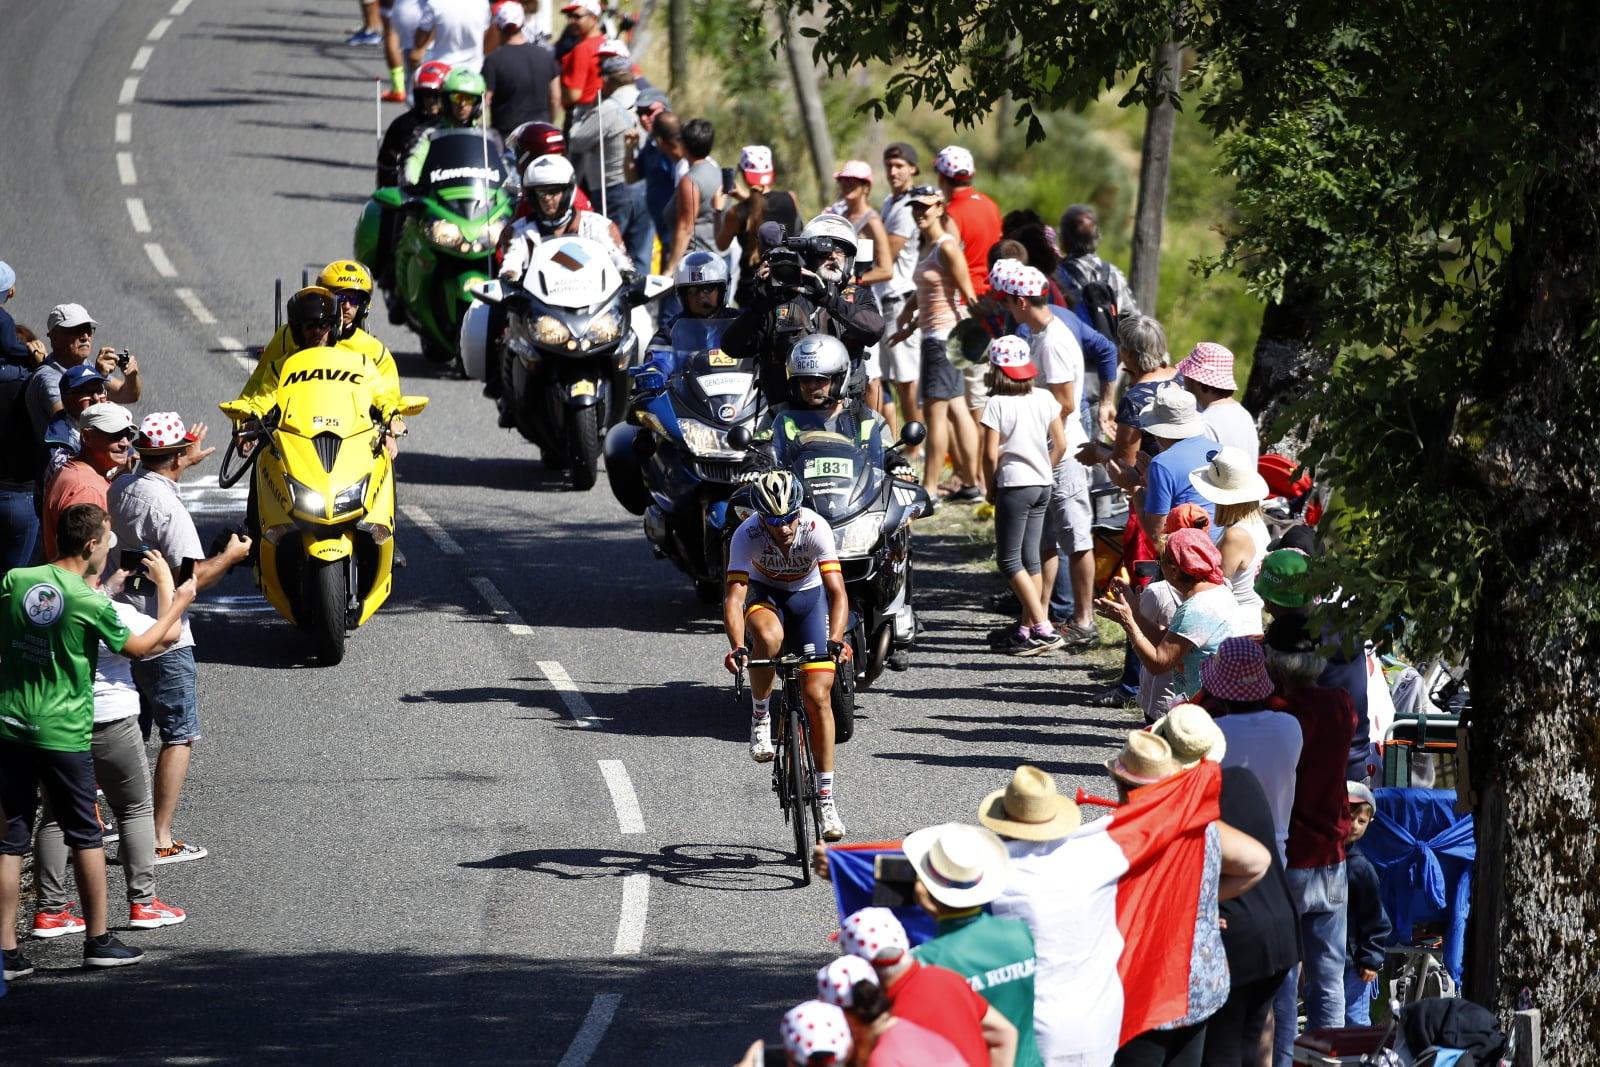 Tour de France 2018 fot. EPA/KIM LUDBROOK